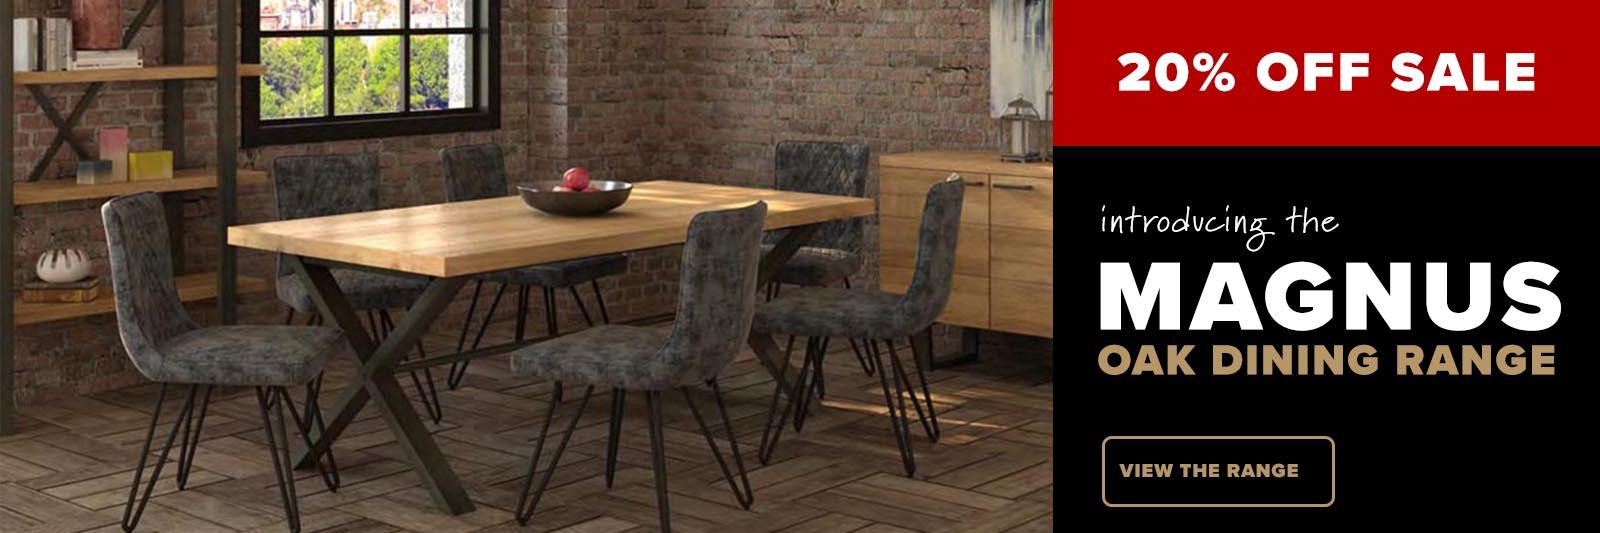 Magnus oak dining furniture